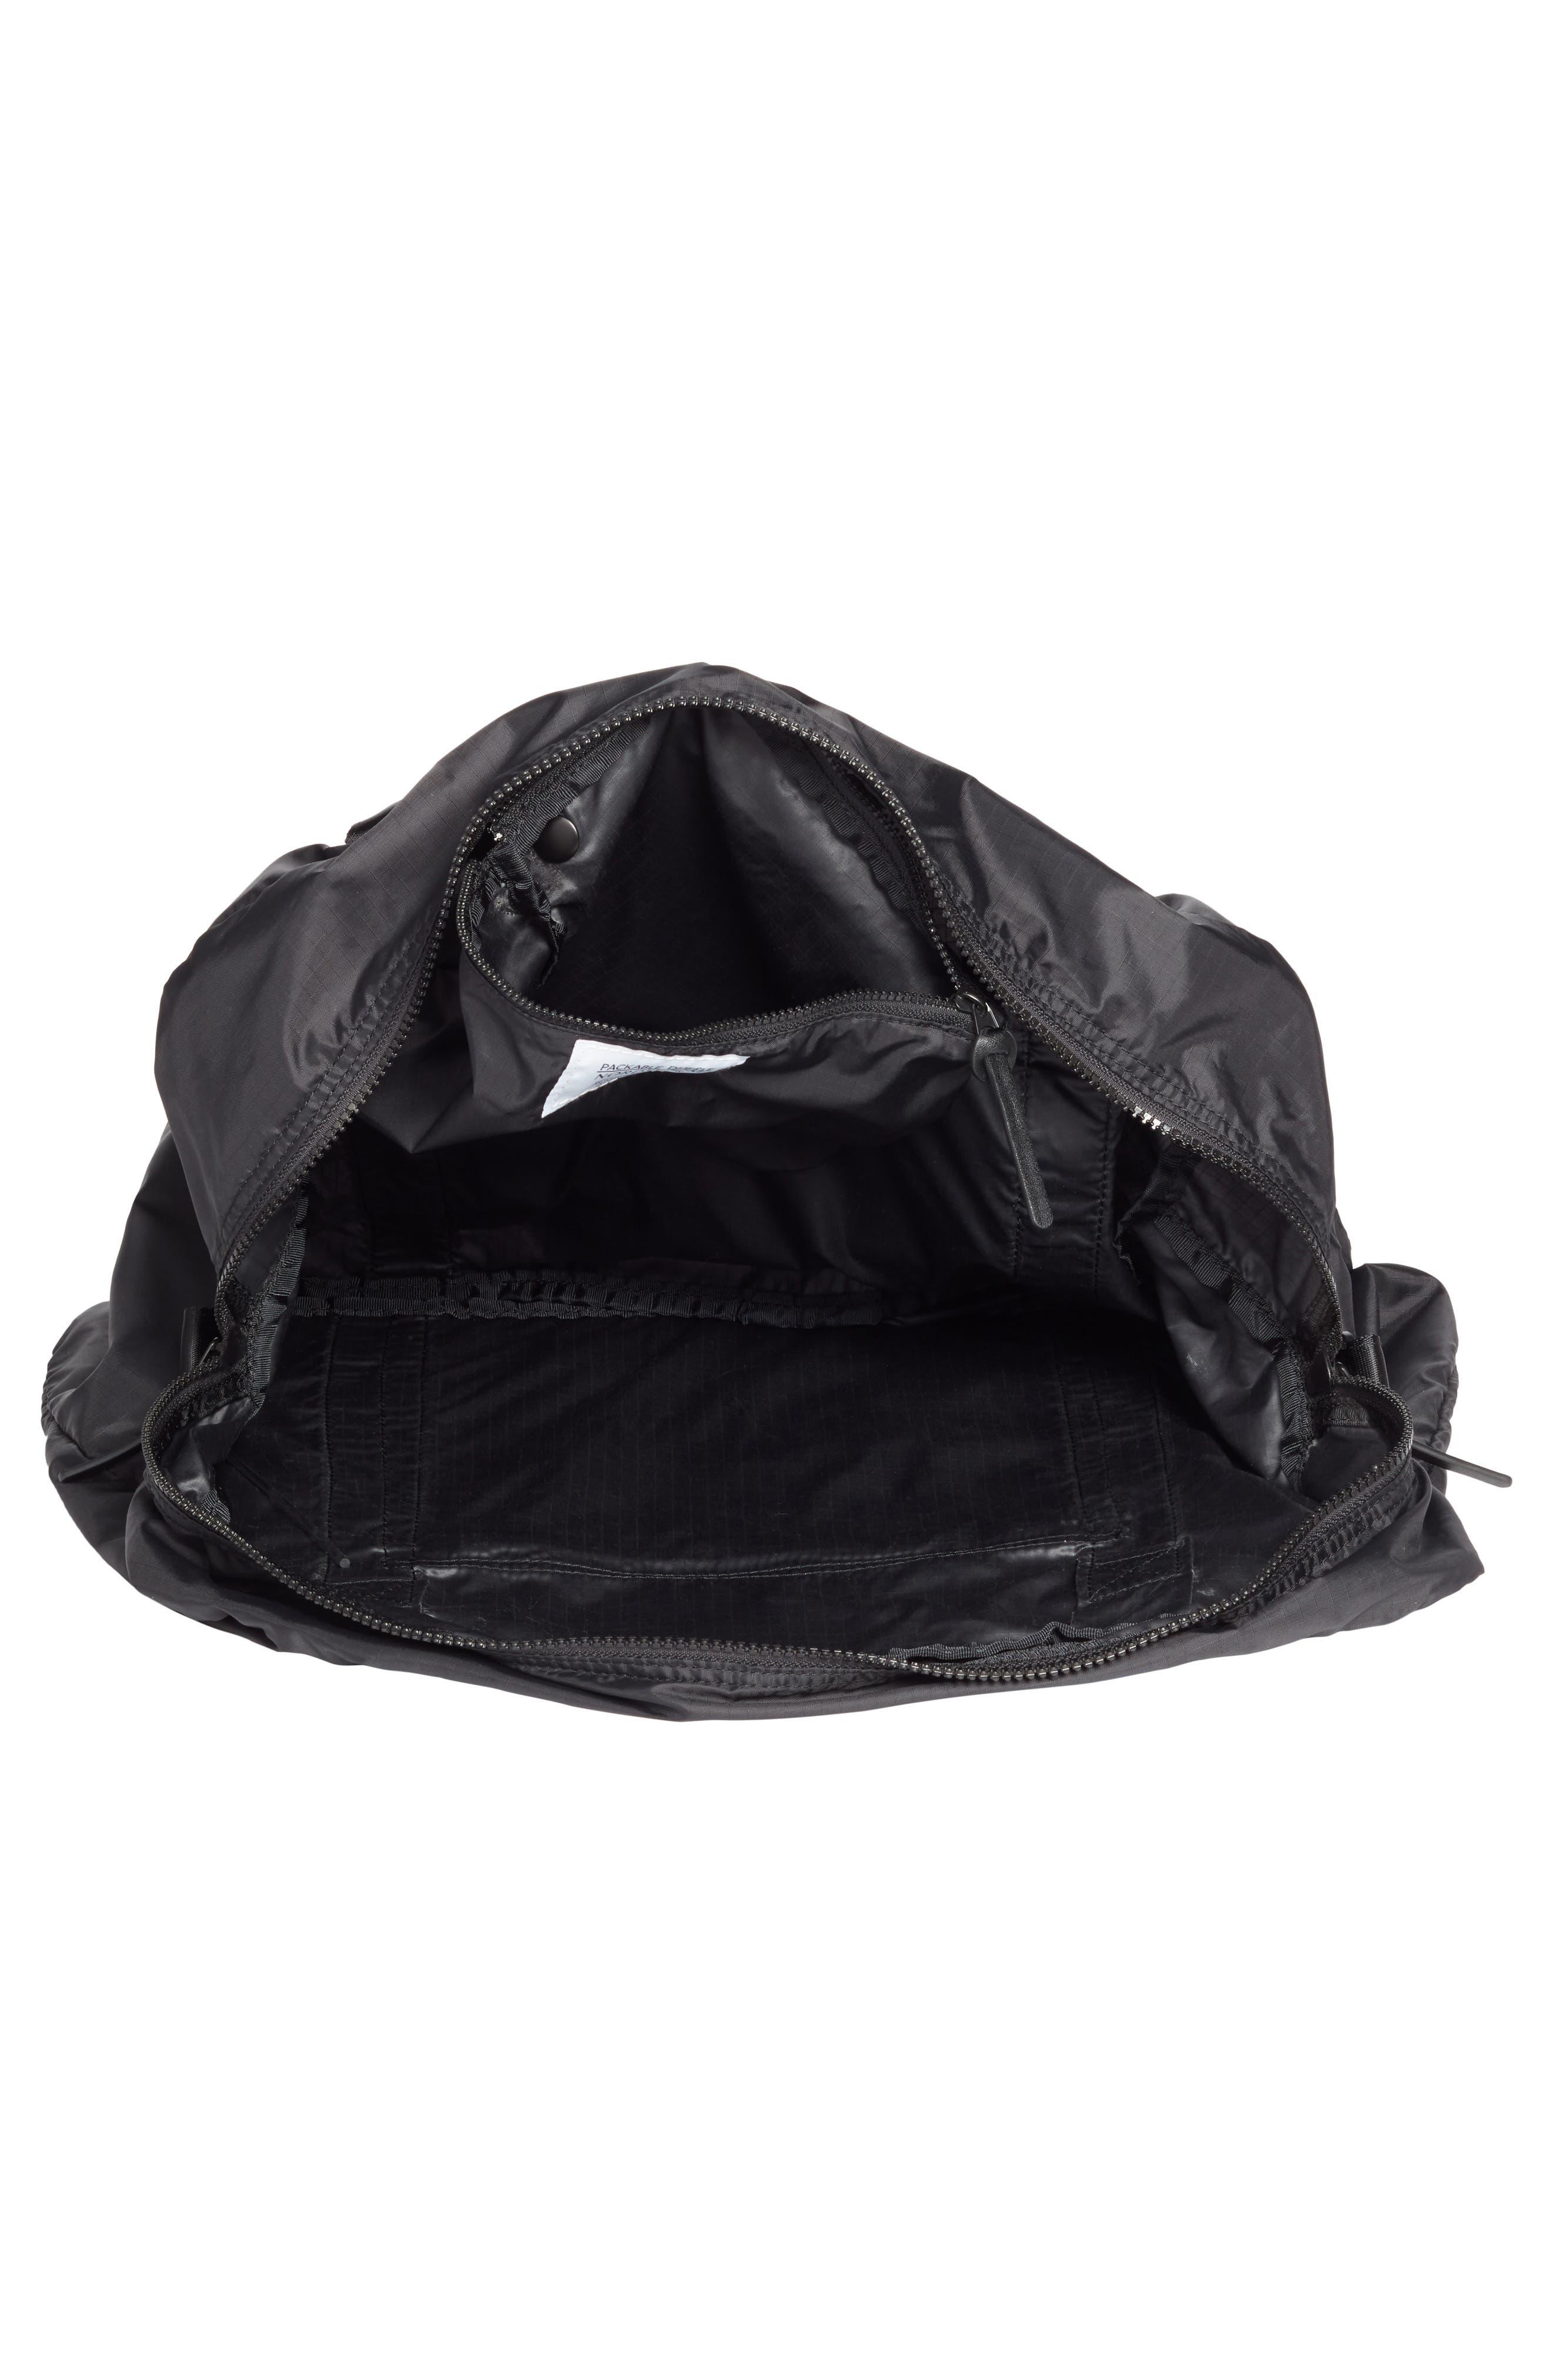 NORDSTROM, Packable Nylon Duffel Bag, Alternate thumbnail 5, color, BLACK